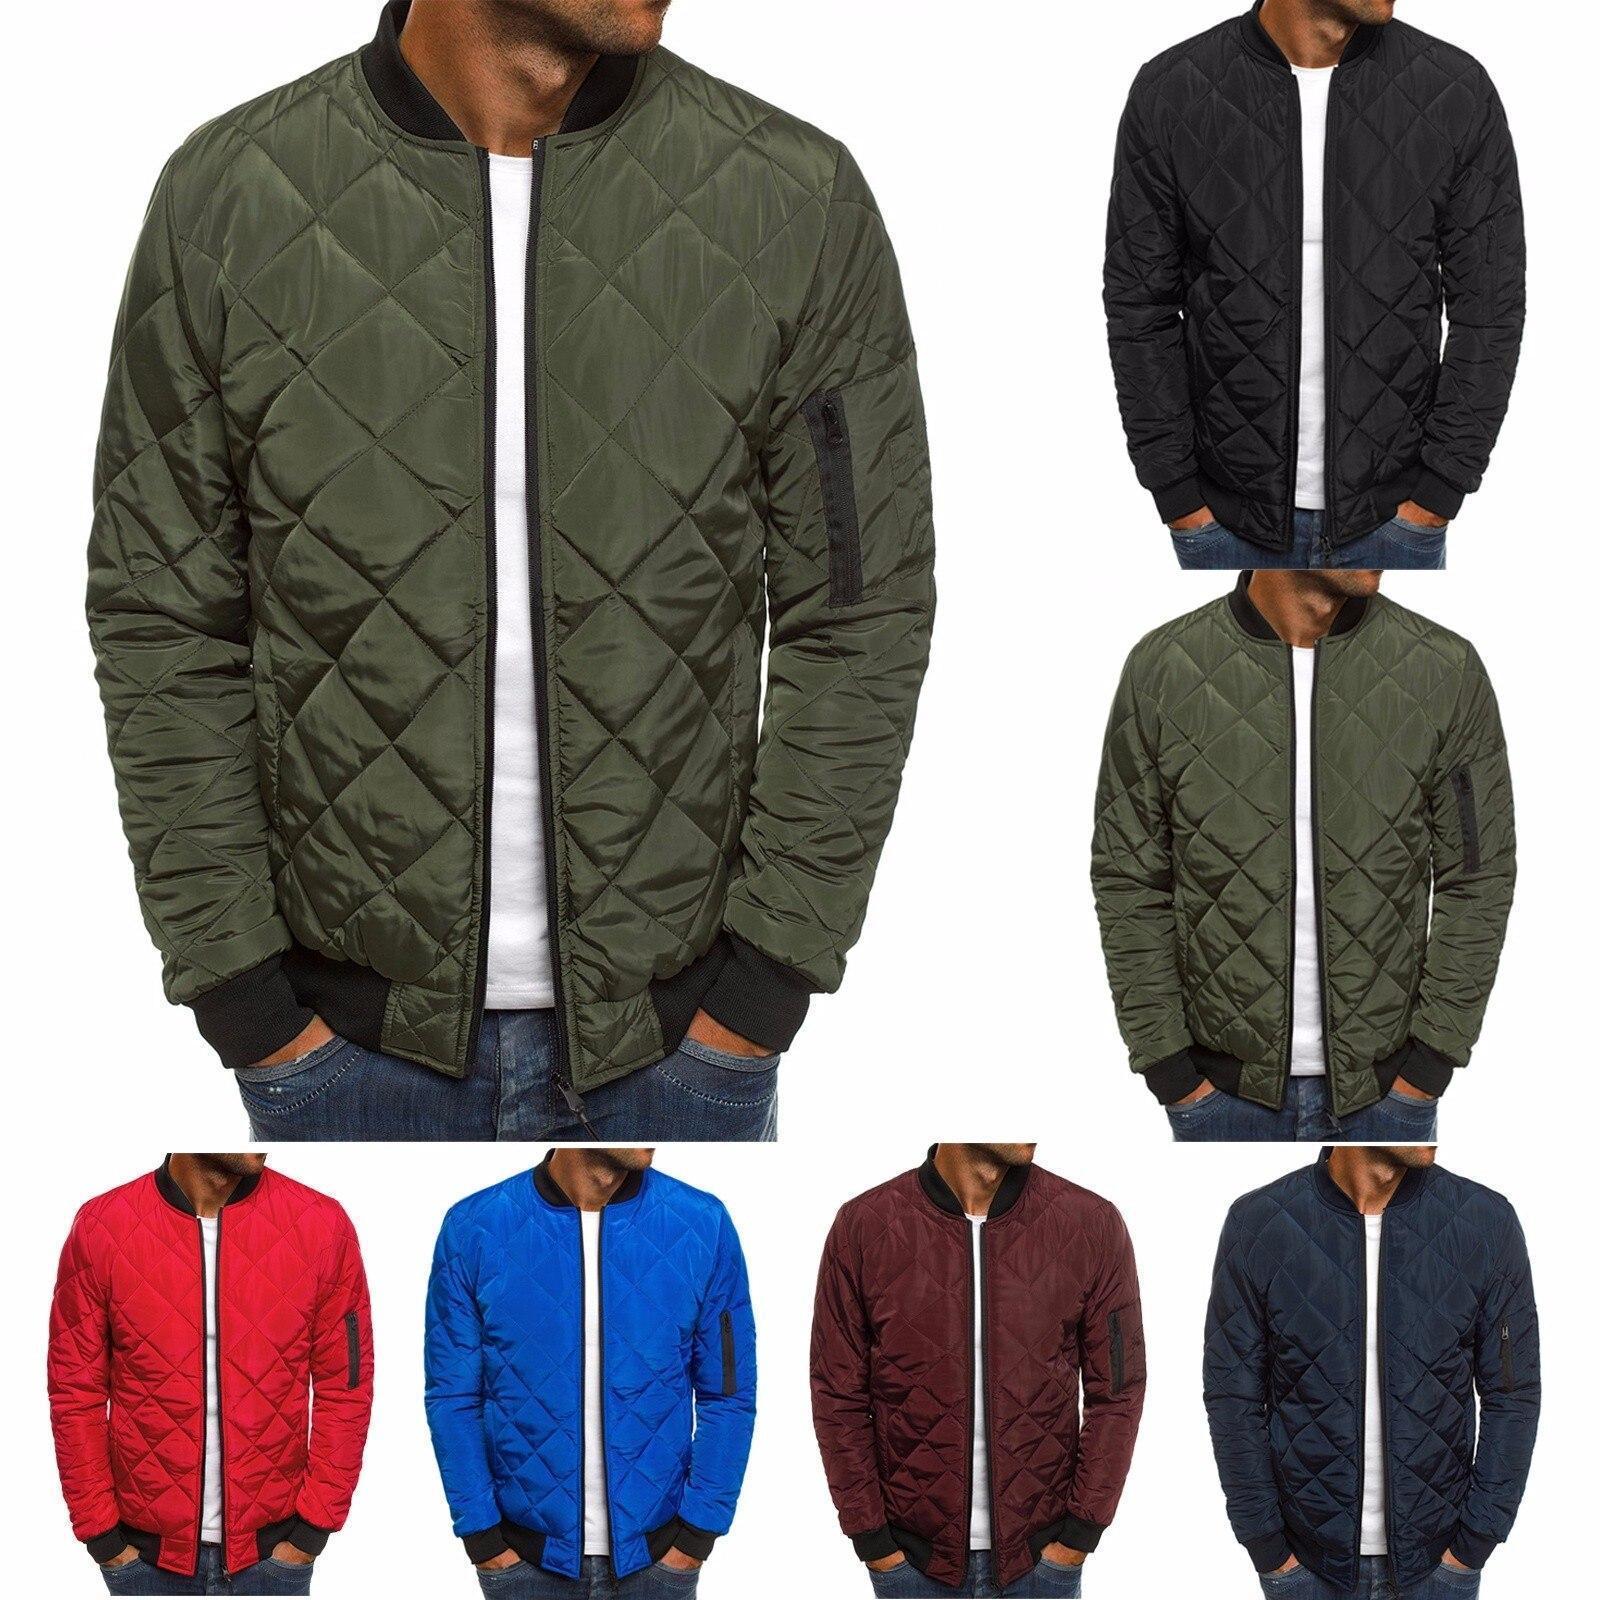 ZOGAA 2019 Men Autumn Casual Plaid Parkas Jacket Autumn Breaker Solid Color Brand Overcoat Winter Clothes Zipper Spring Jackets